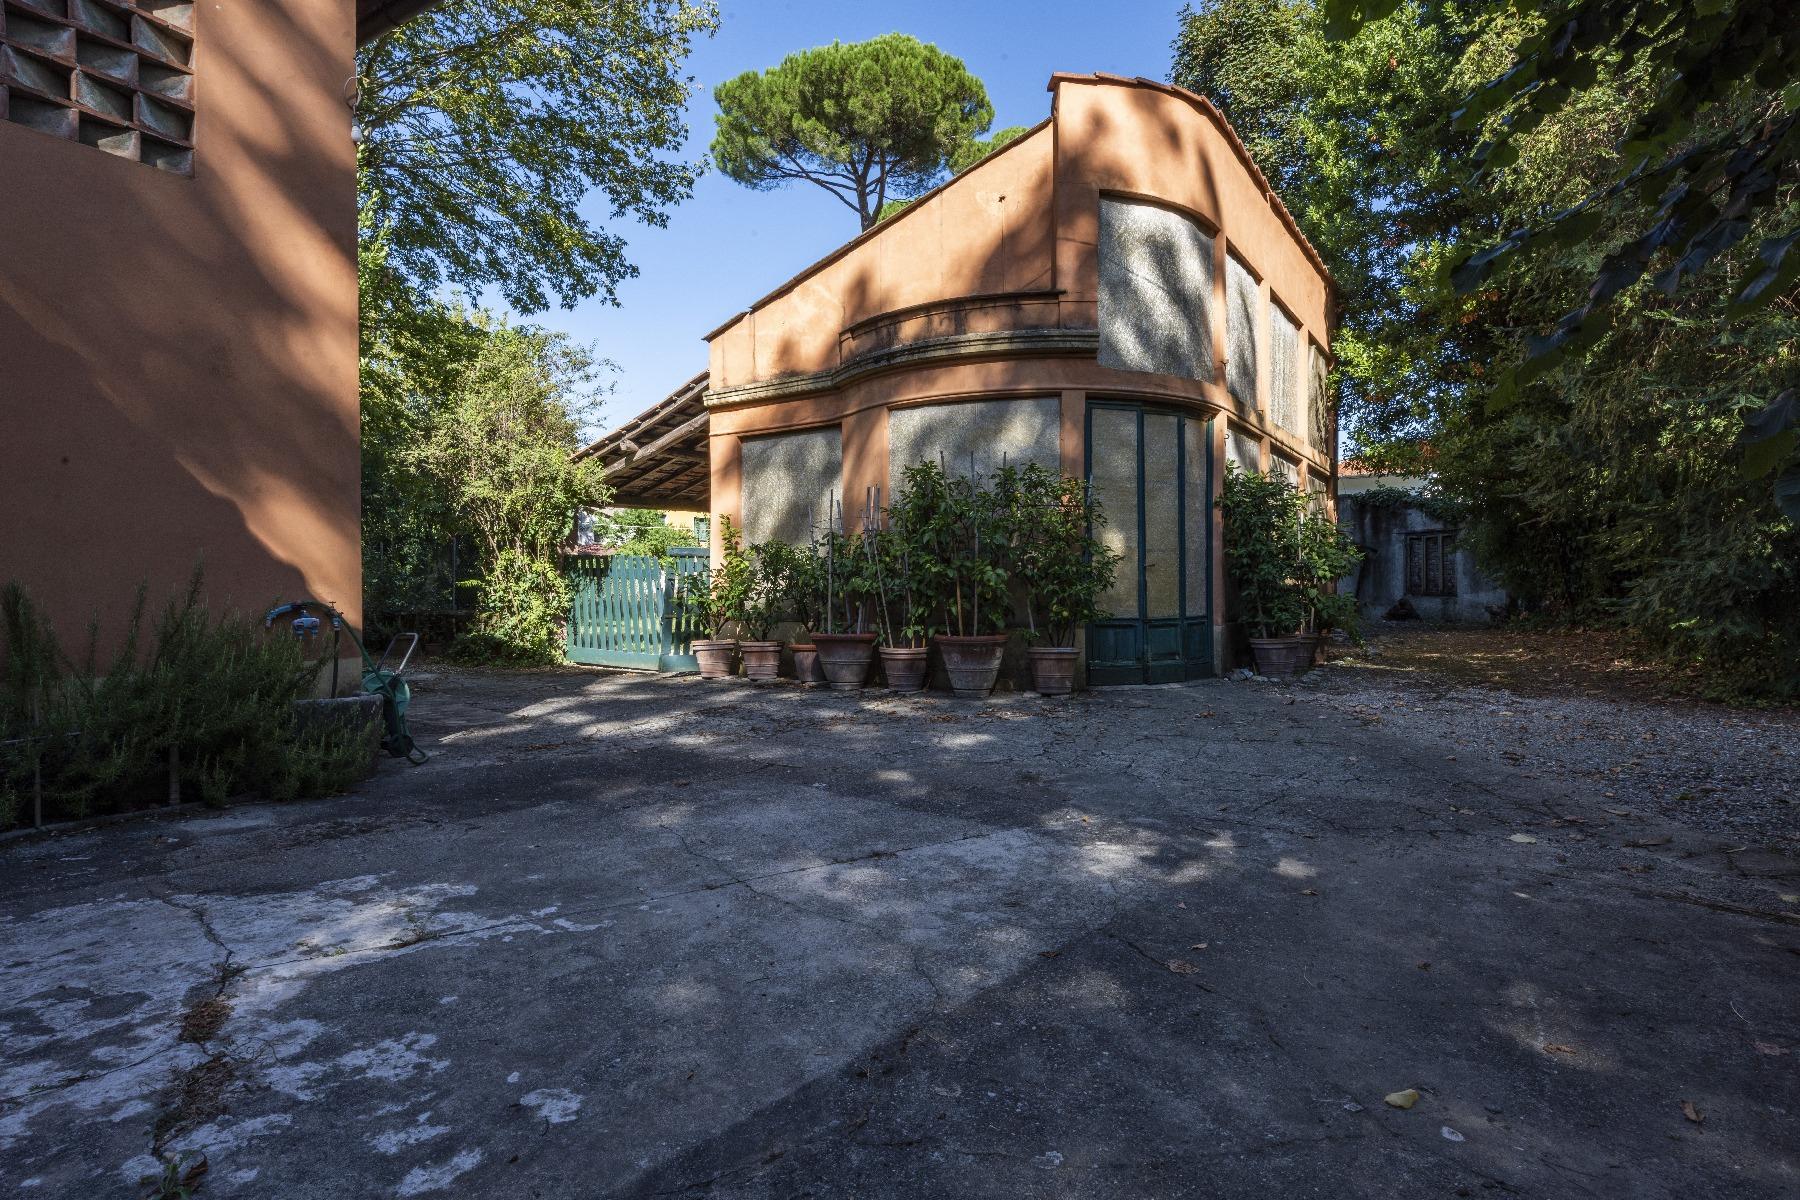 Villa in Vendita a Lucca: 5 locali, 660 mq - Foto 23